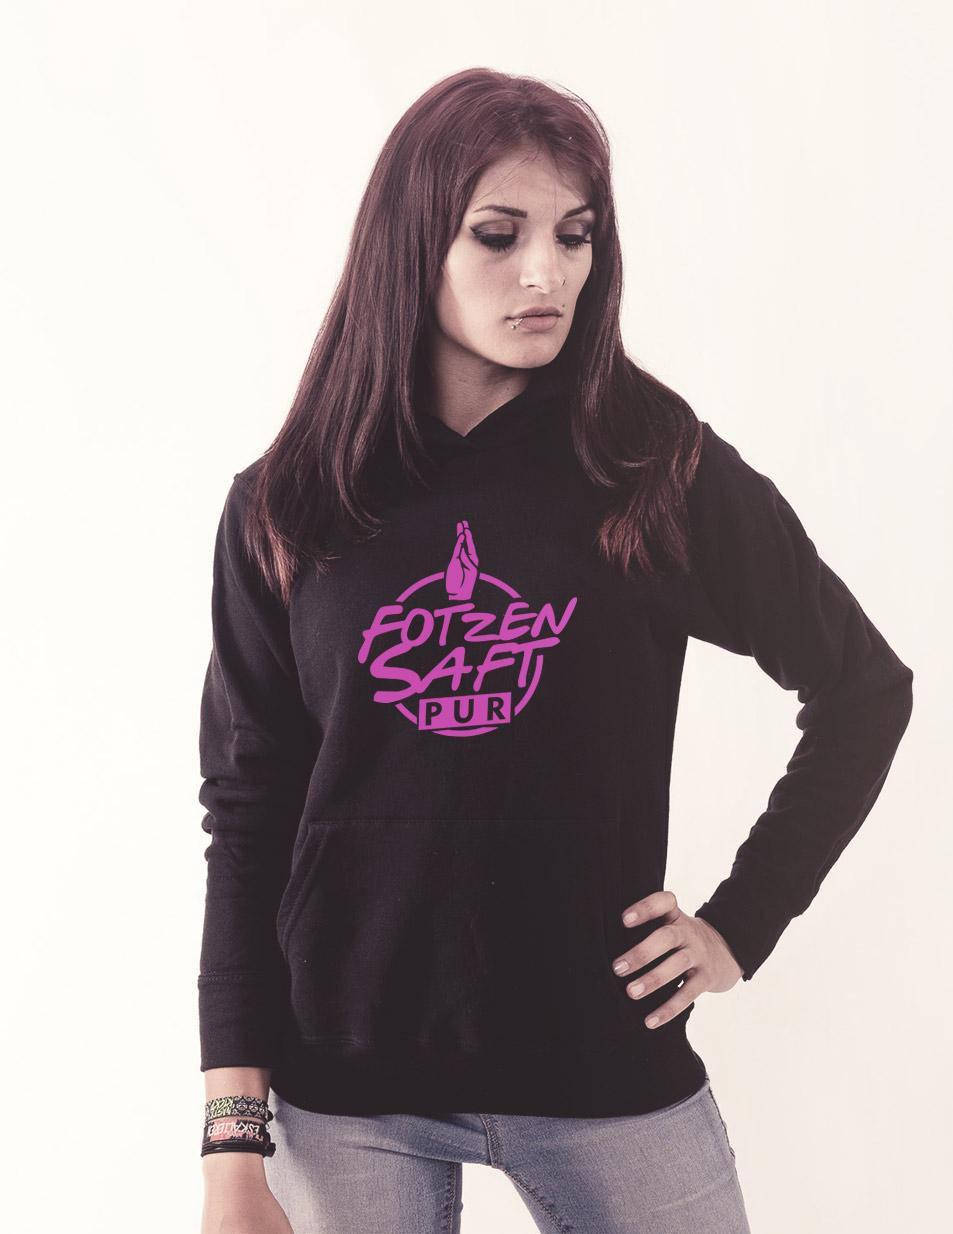 Fotzensaft Girly Kappu neonrosa auf schwarz